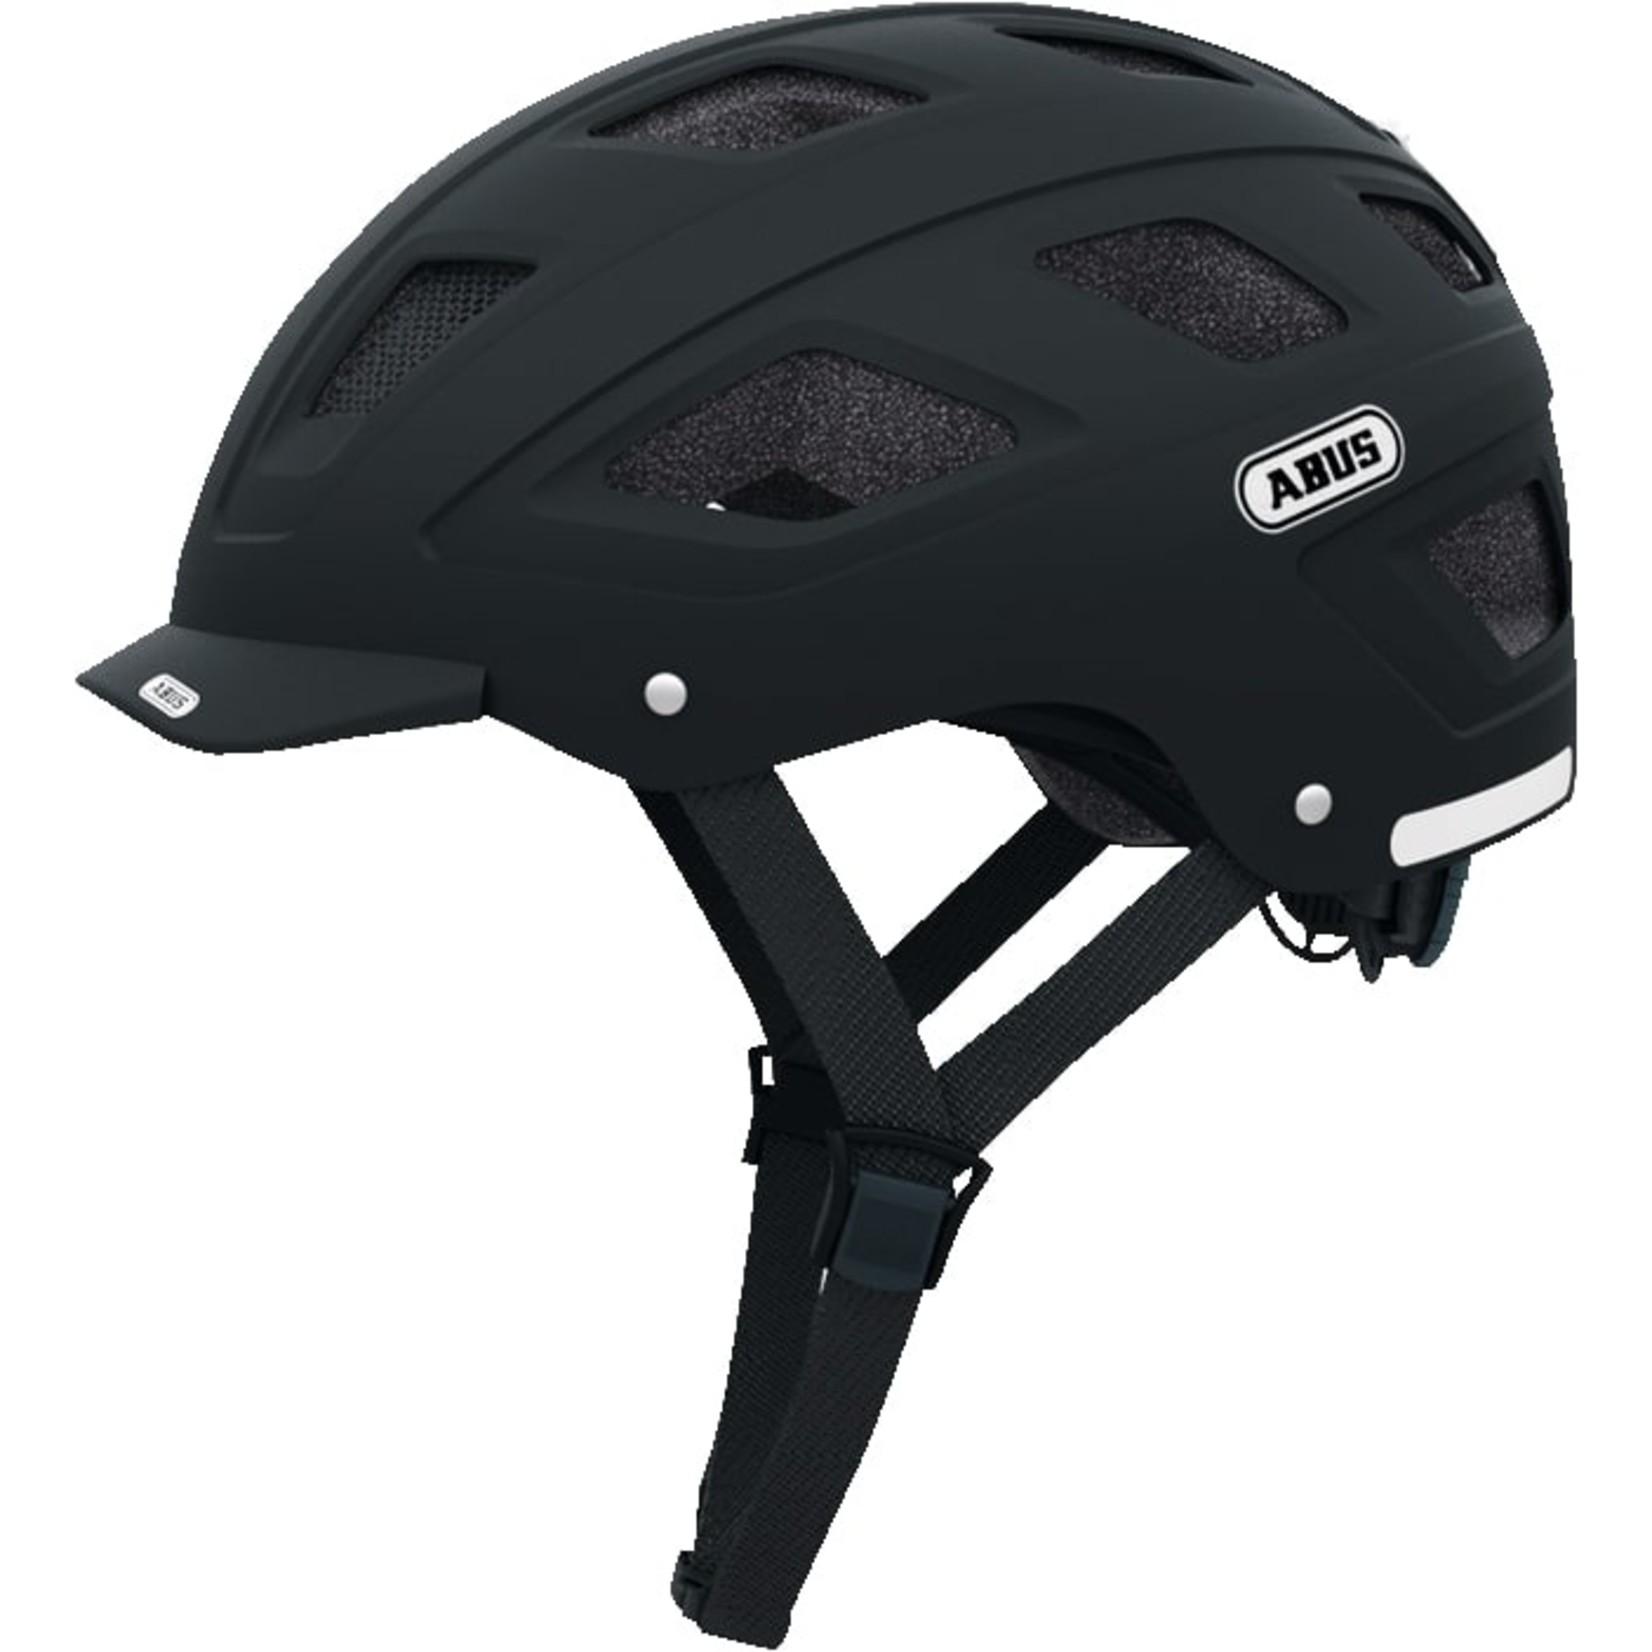 Abus Abus Hyban 1.0 Helmet